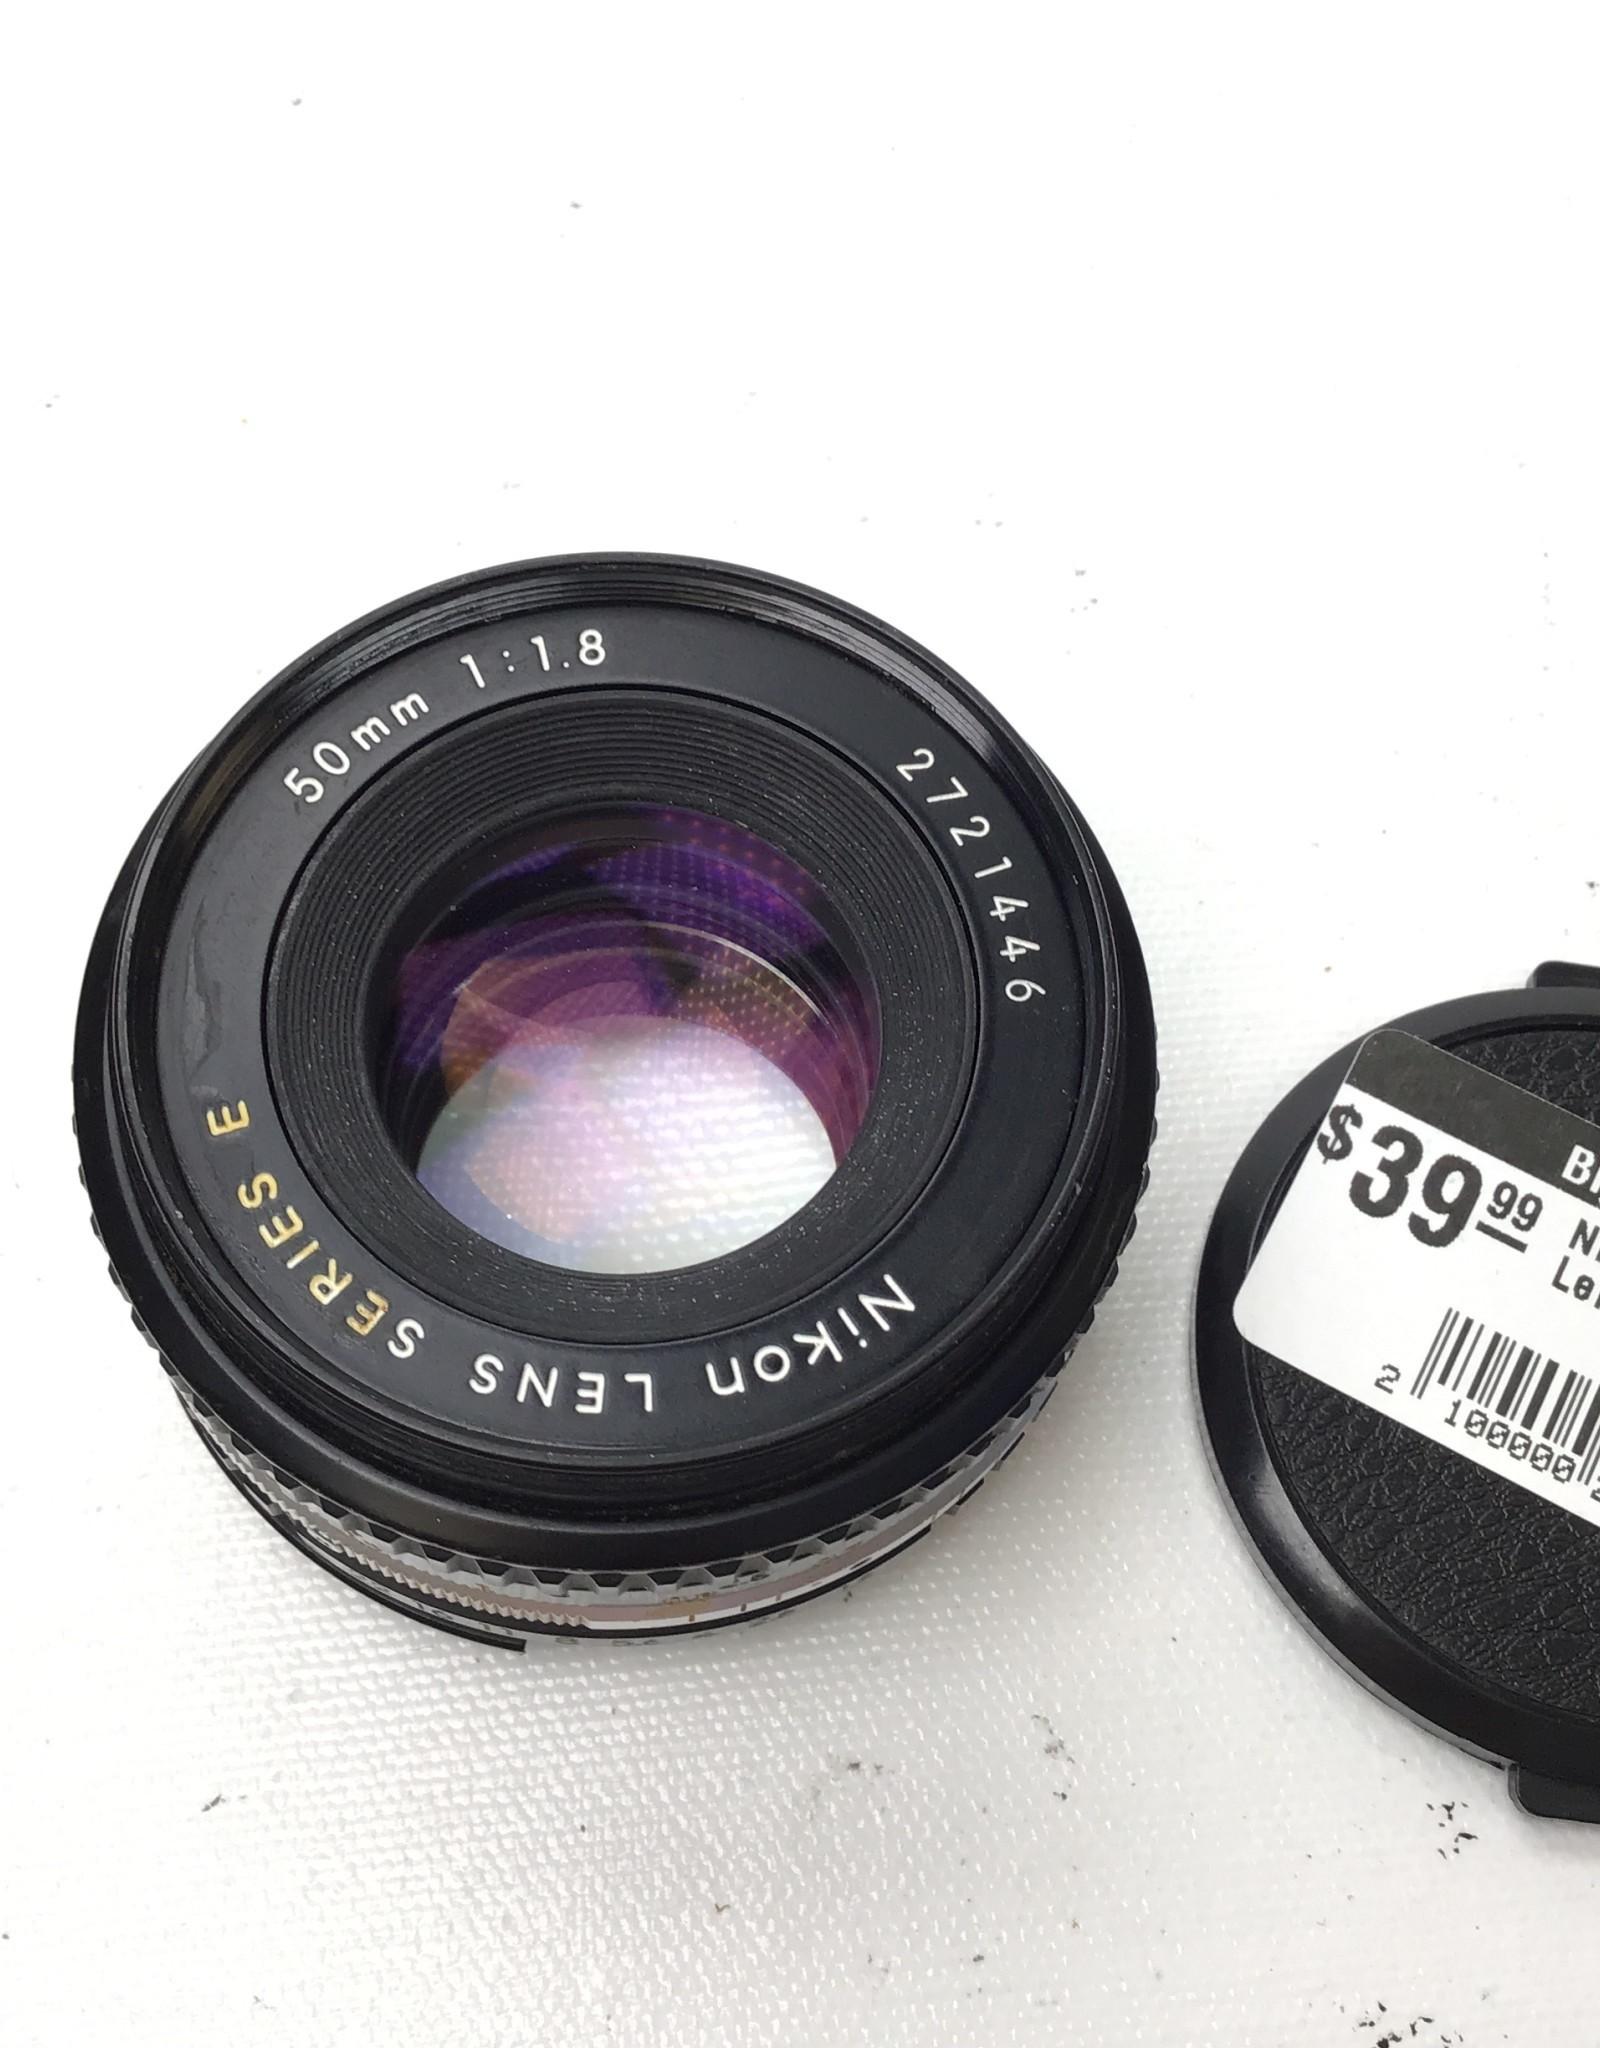 NIKON Nikon Series E 50mm f1.8 Lens Used Good